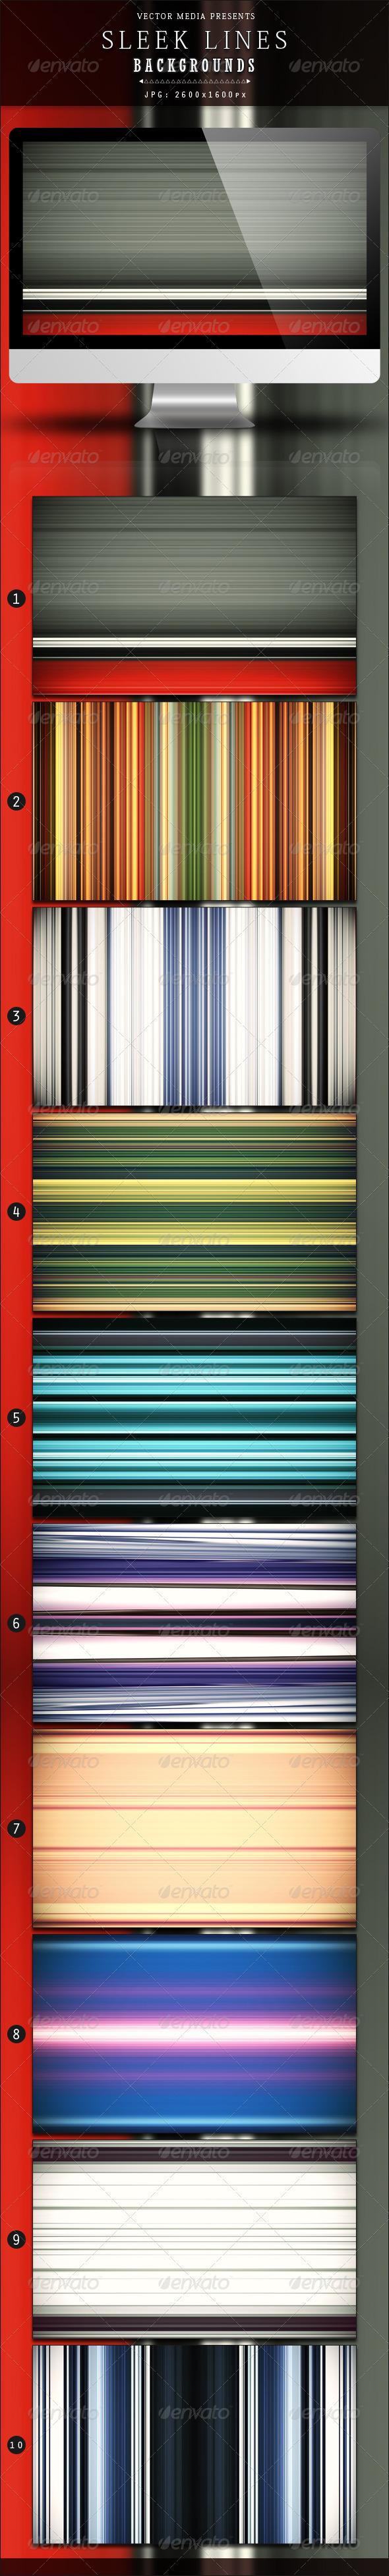 Sleek Lines - Backgrounds - Backgrounds Graphics